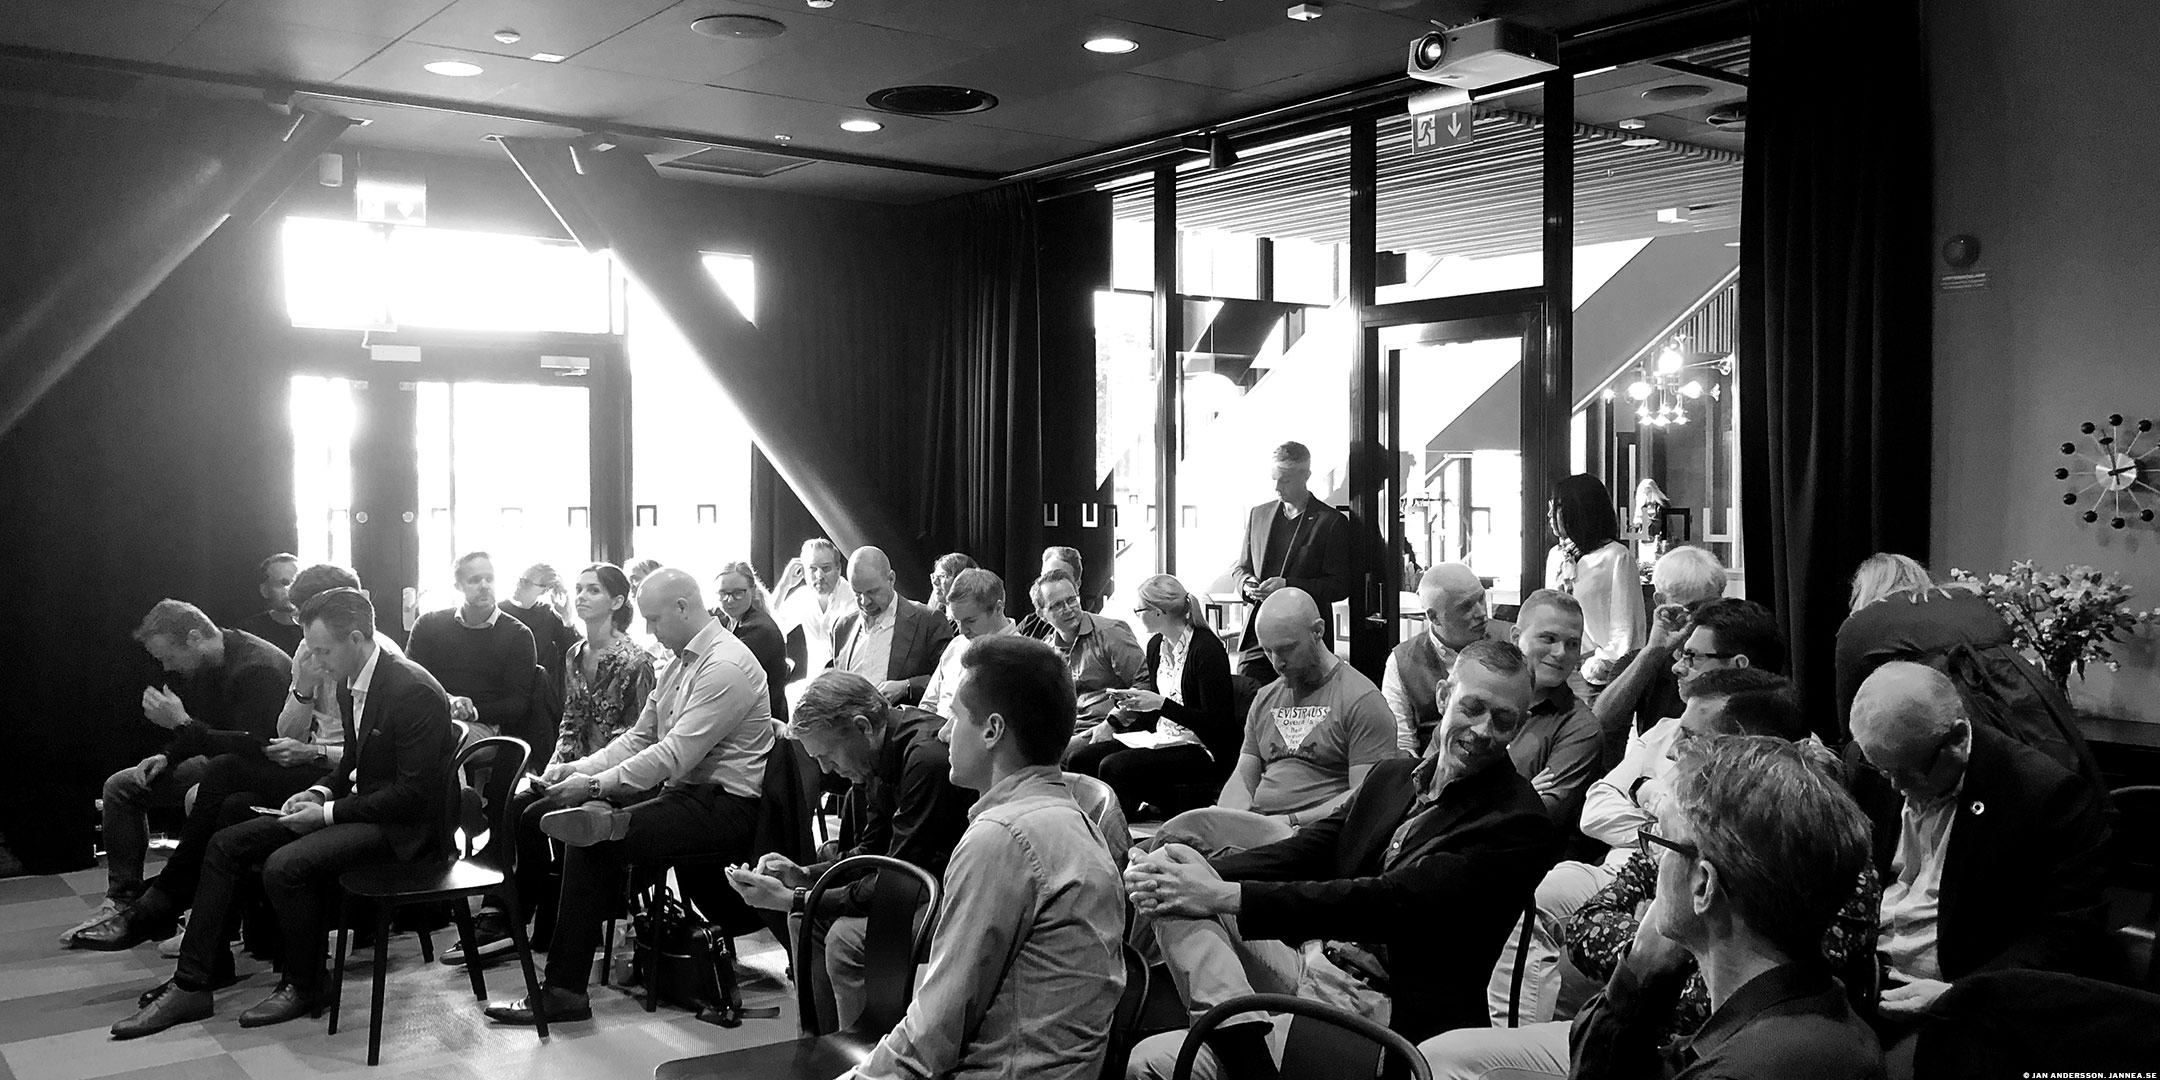 Ett möte mellan experter | © Jan Andersson